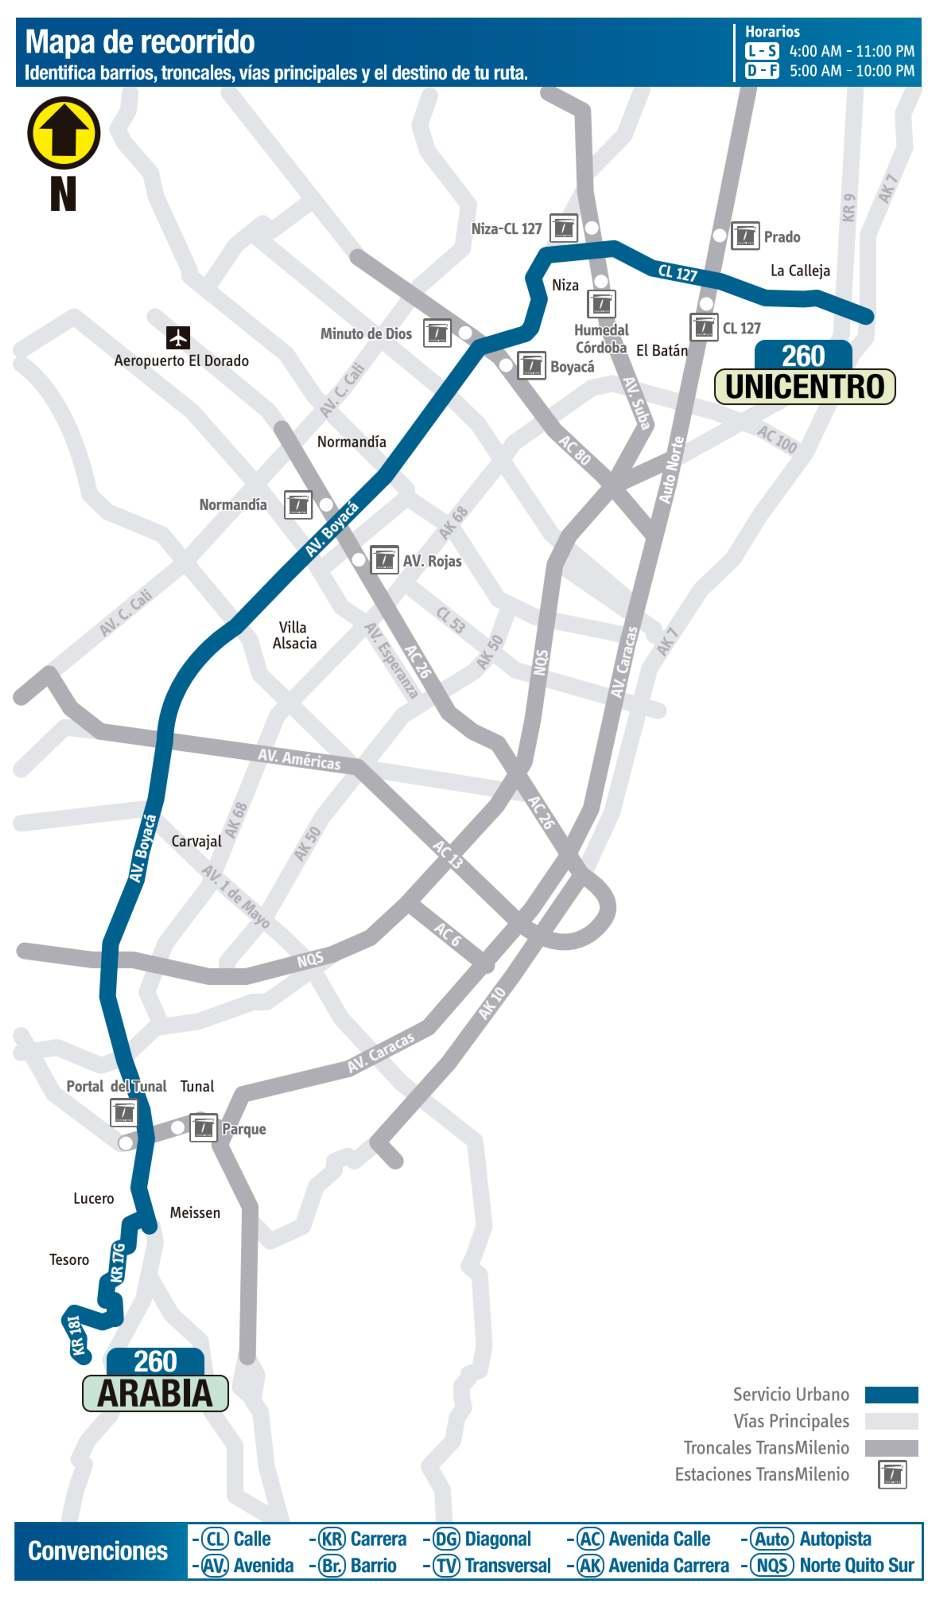 Ruta SITP: 260 Unicentro ↔ Arabia (mapa)